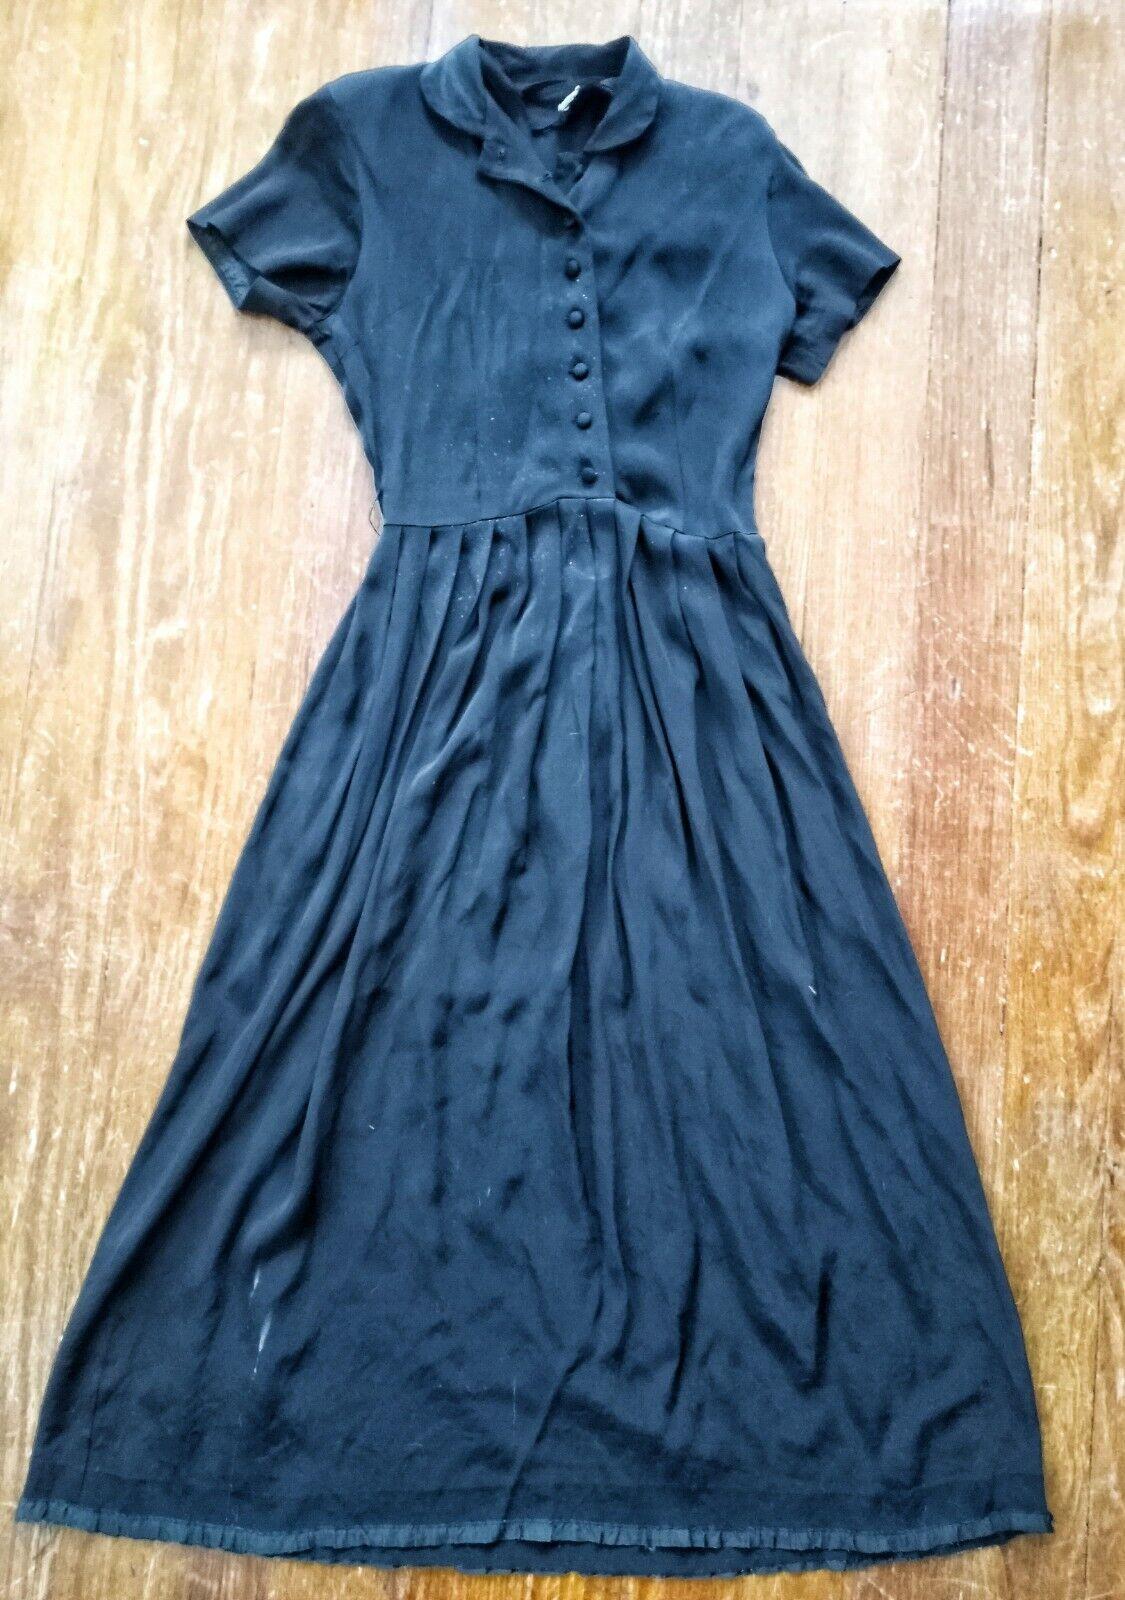 Vintage 1940's Black Rayon Dress - image 3